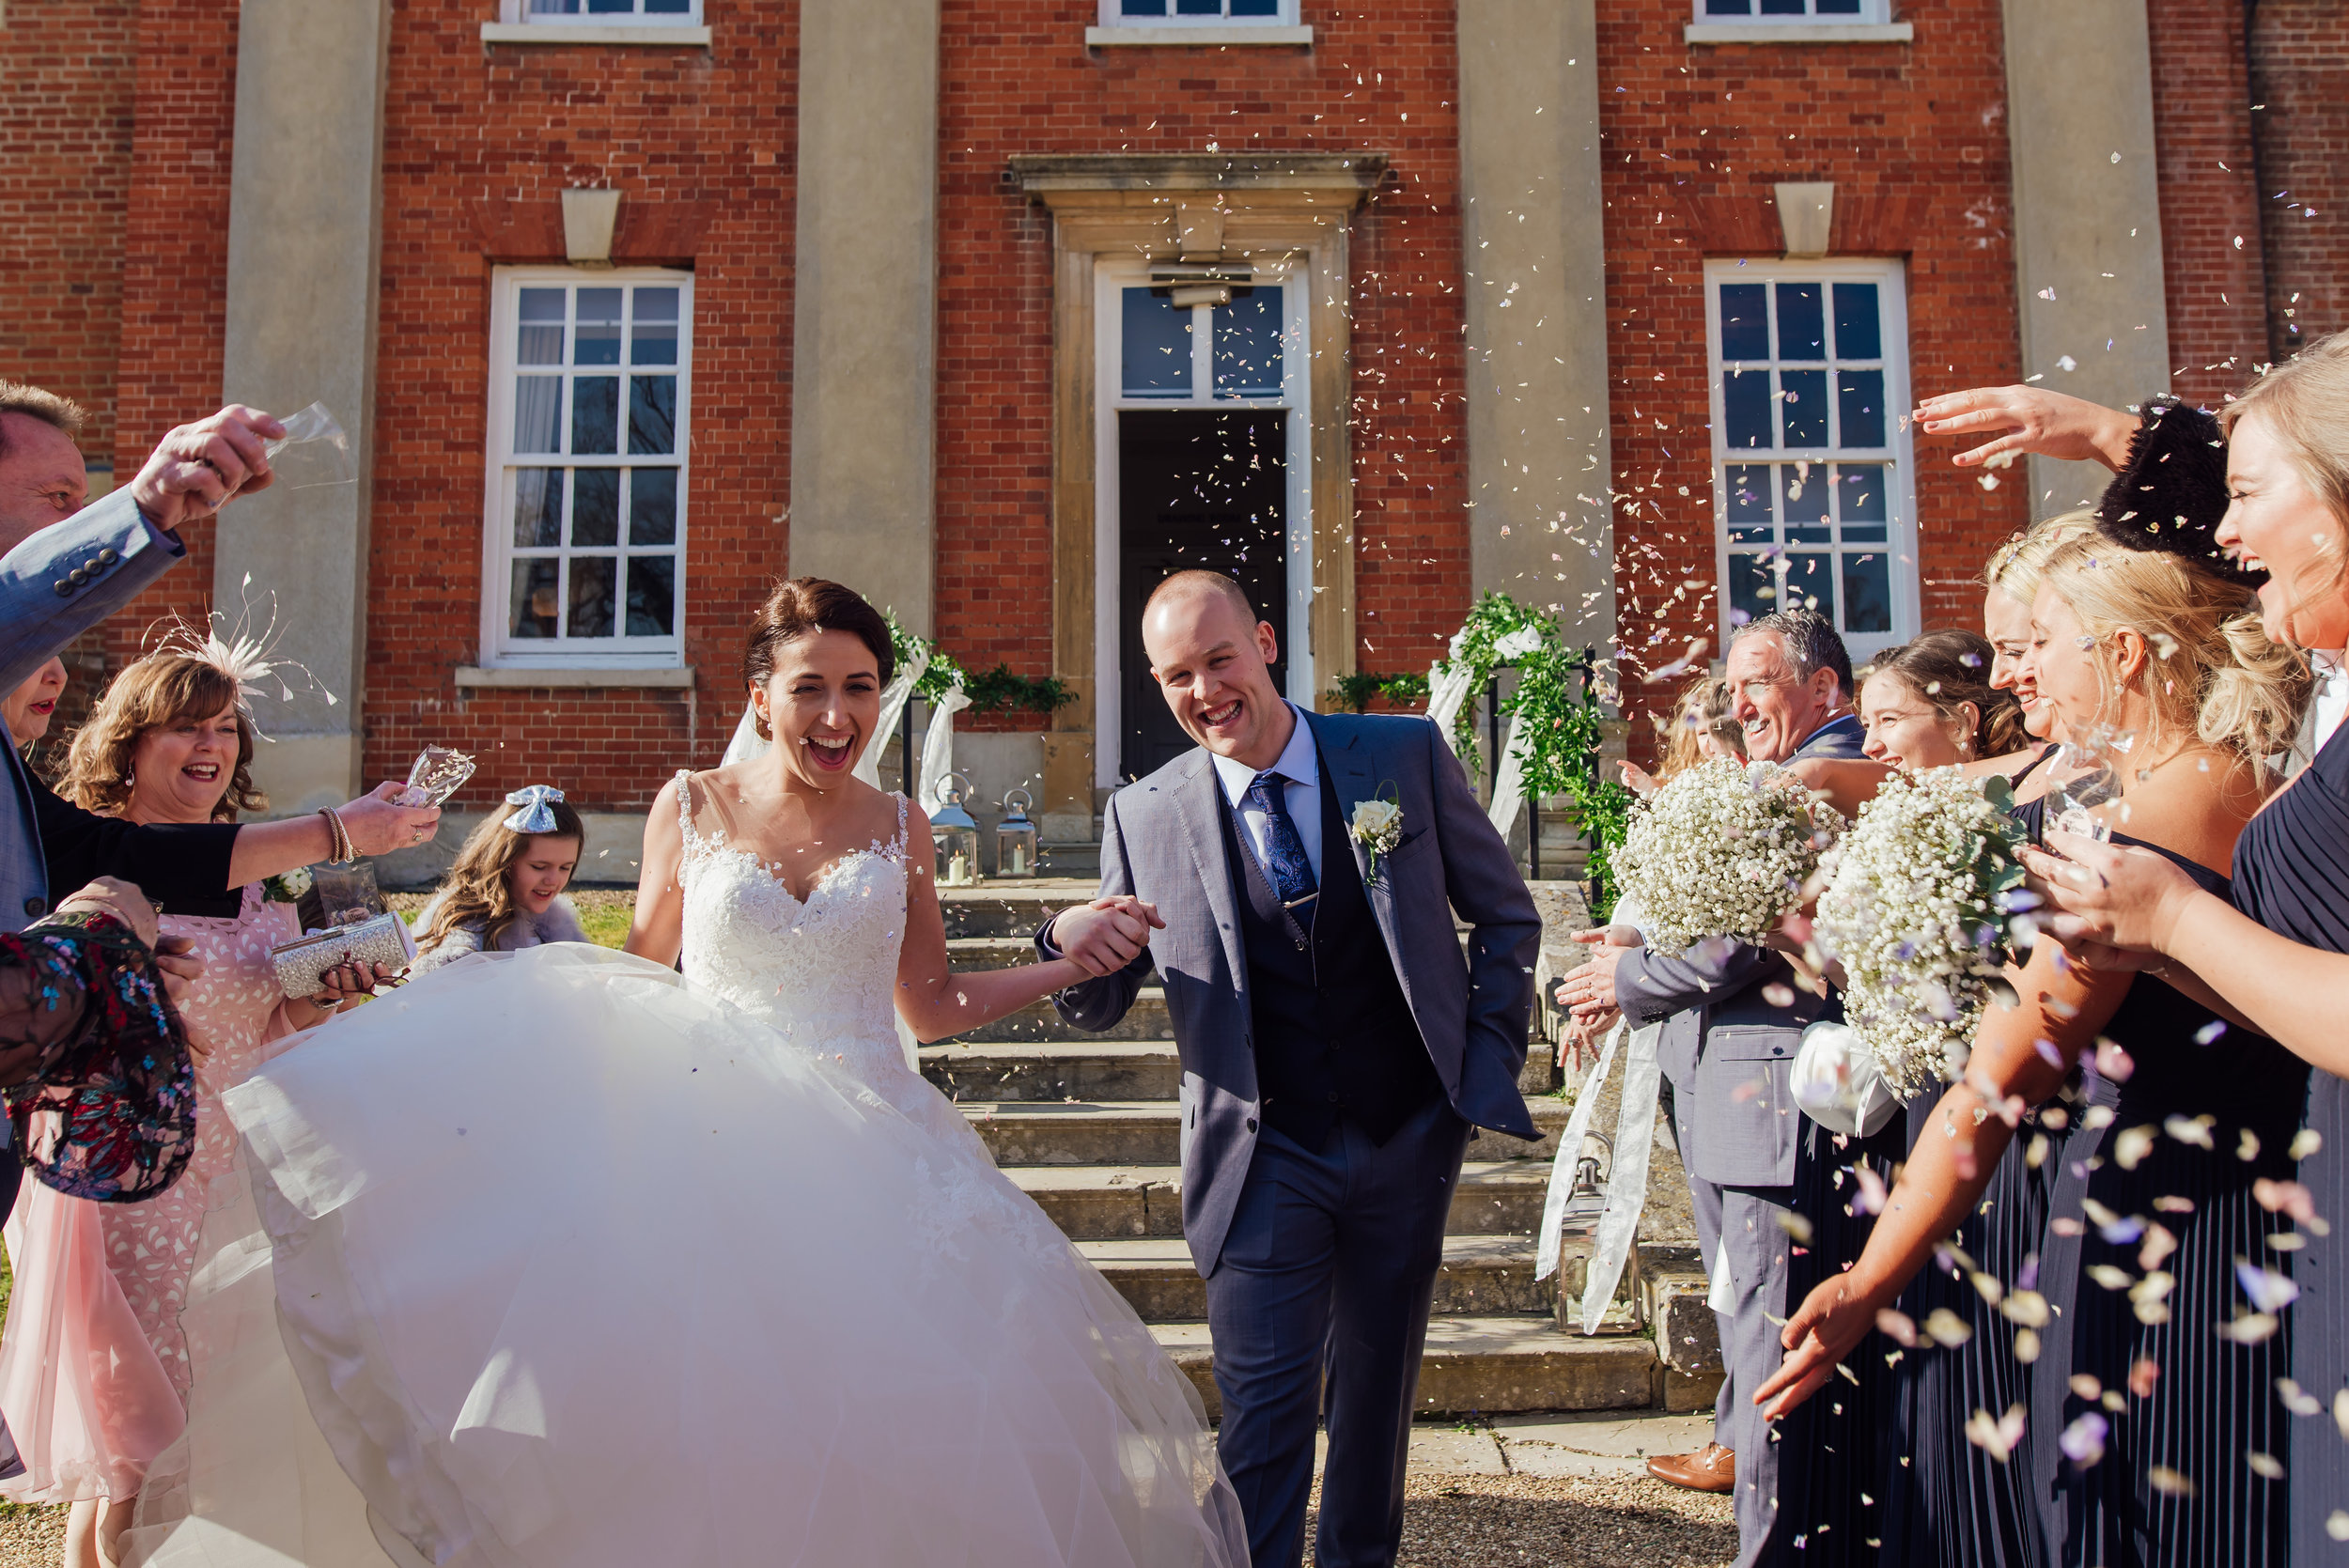 Sarah-Fishlock-Photography-Hampshire-wedding-photographer : fleet-wedding-photographer-fleet : warbrook-house-wedding-venue : warbrook-house-wedding-photographer : hampshire-wedding-venue : hampshire-stately-home-wedding-venue / fun-wedding-photo /wedding-photo-booth-hampshire / fun-wedding-photographer /